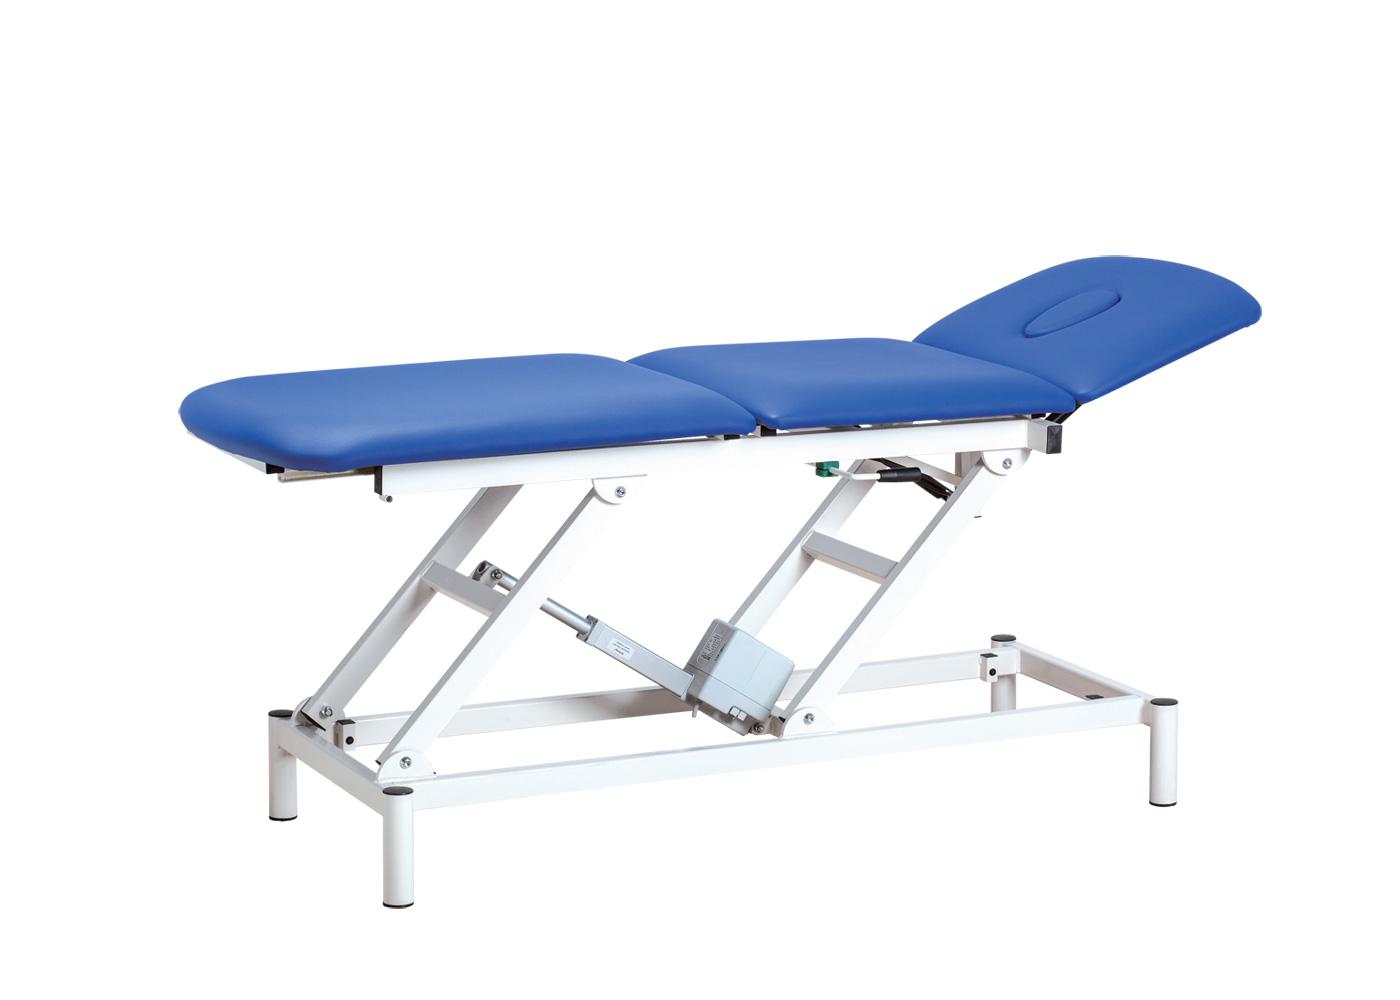 Lettini Fisioterapia Elettrici Usati: Weelko lettino elettrico per fisioterapia e osteopatia ...